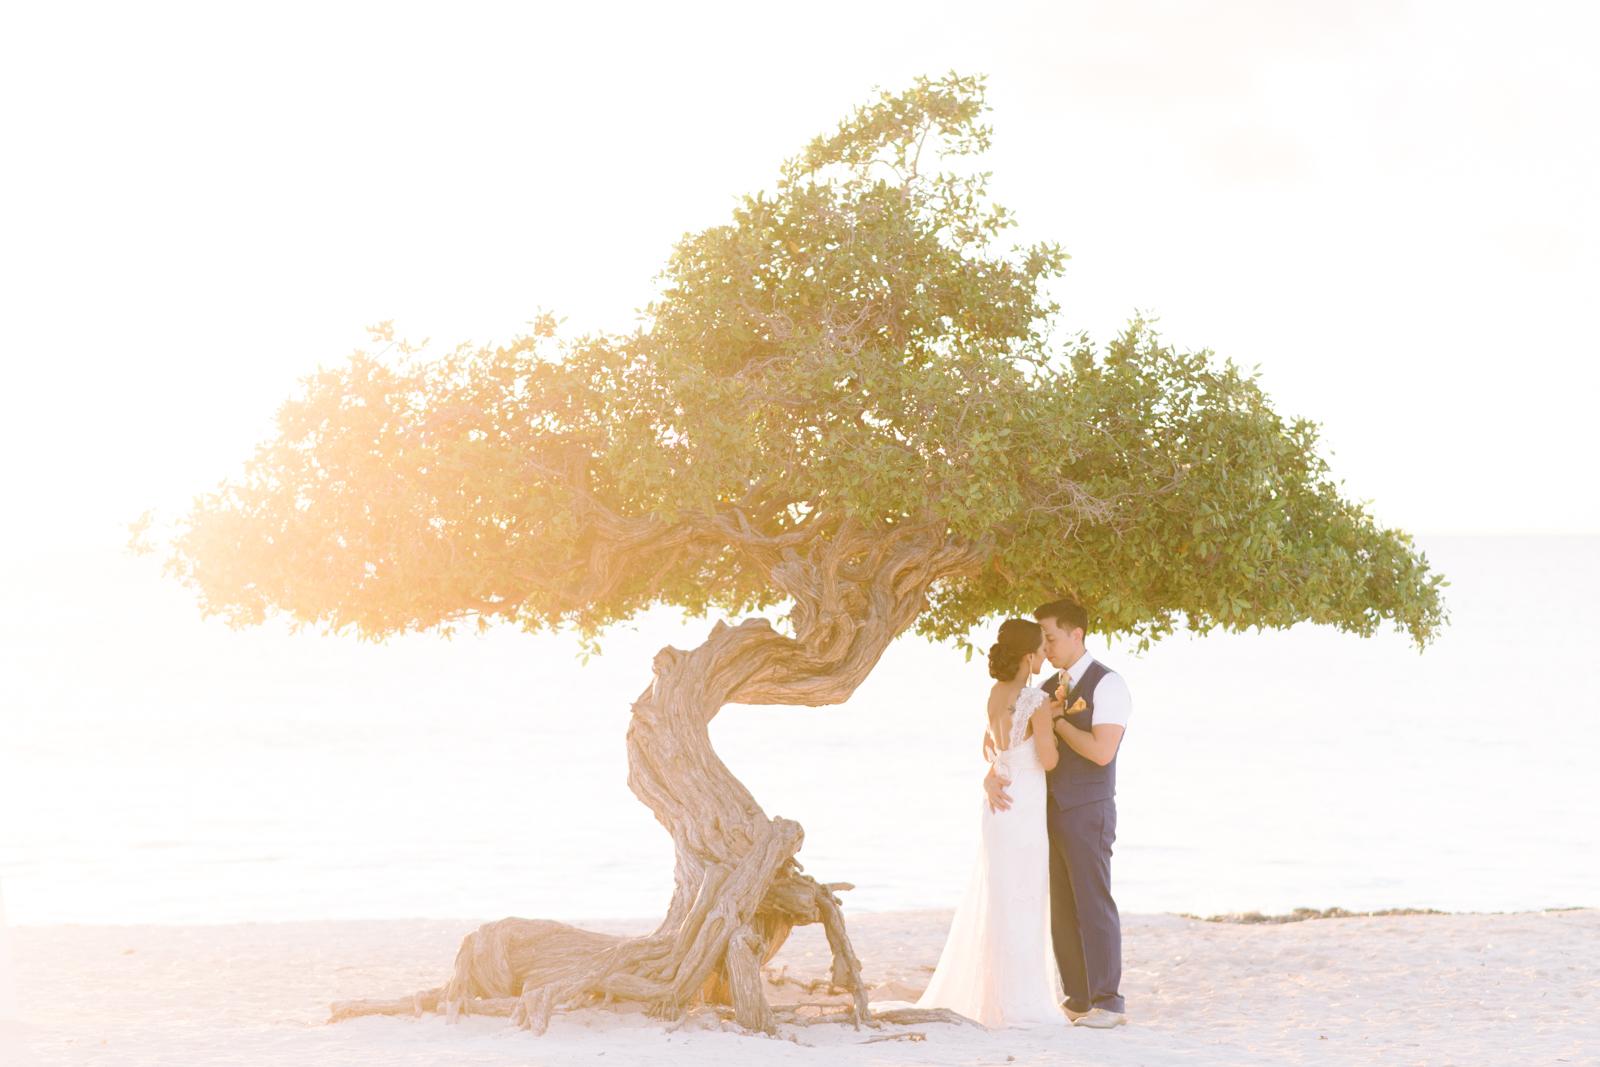 tara mcmullen photography amsterdam manor hotel wedding in aruba best wedding venue in aruba destination wedding photographer aruba indian wedding in aruba-031